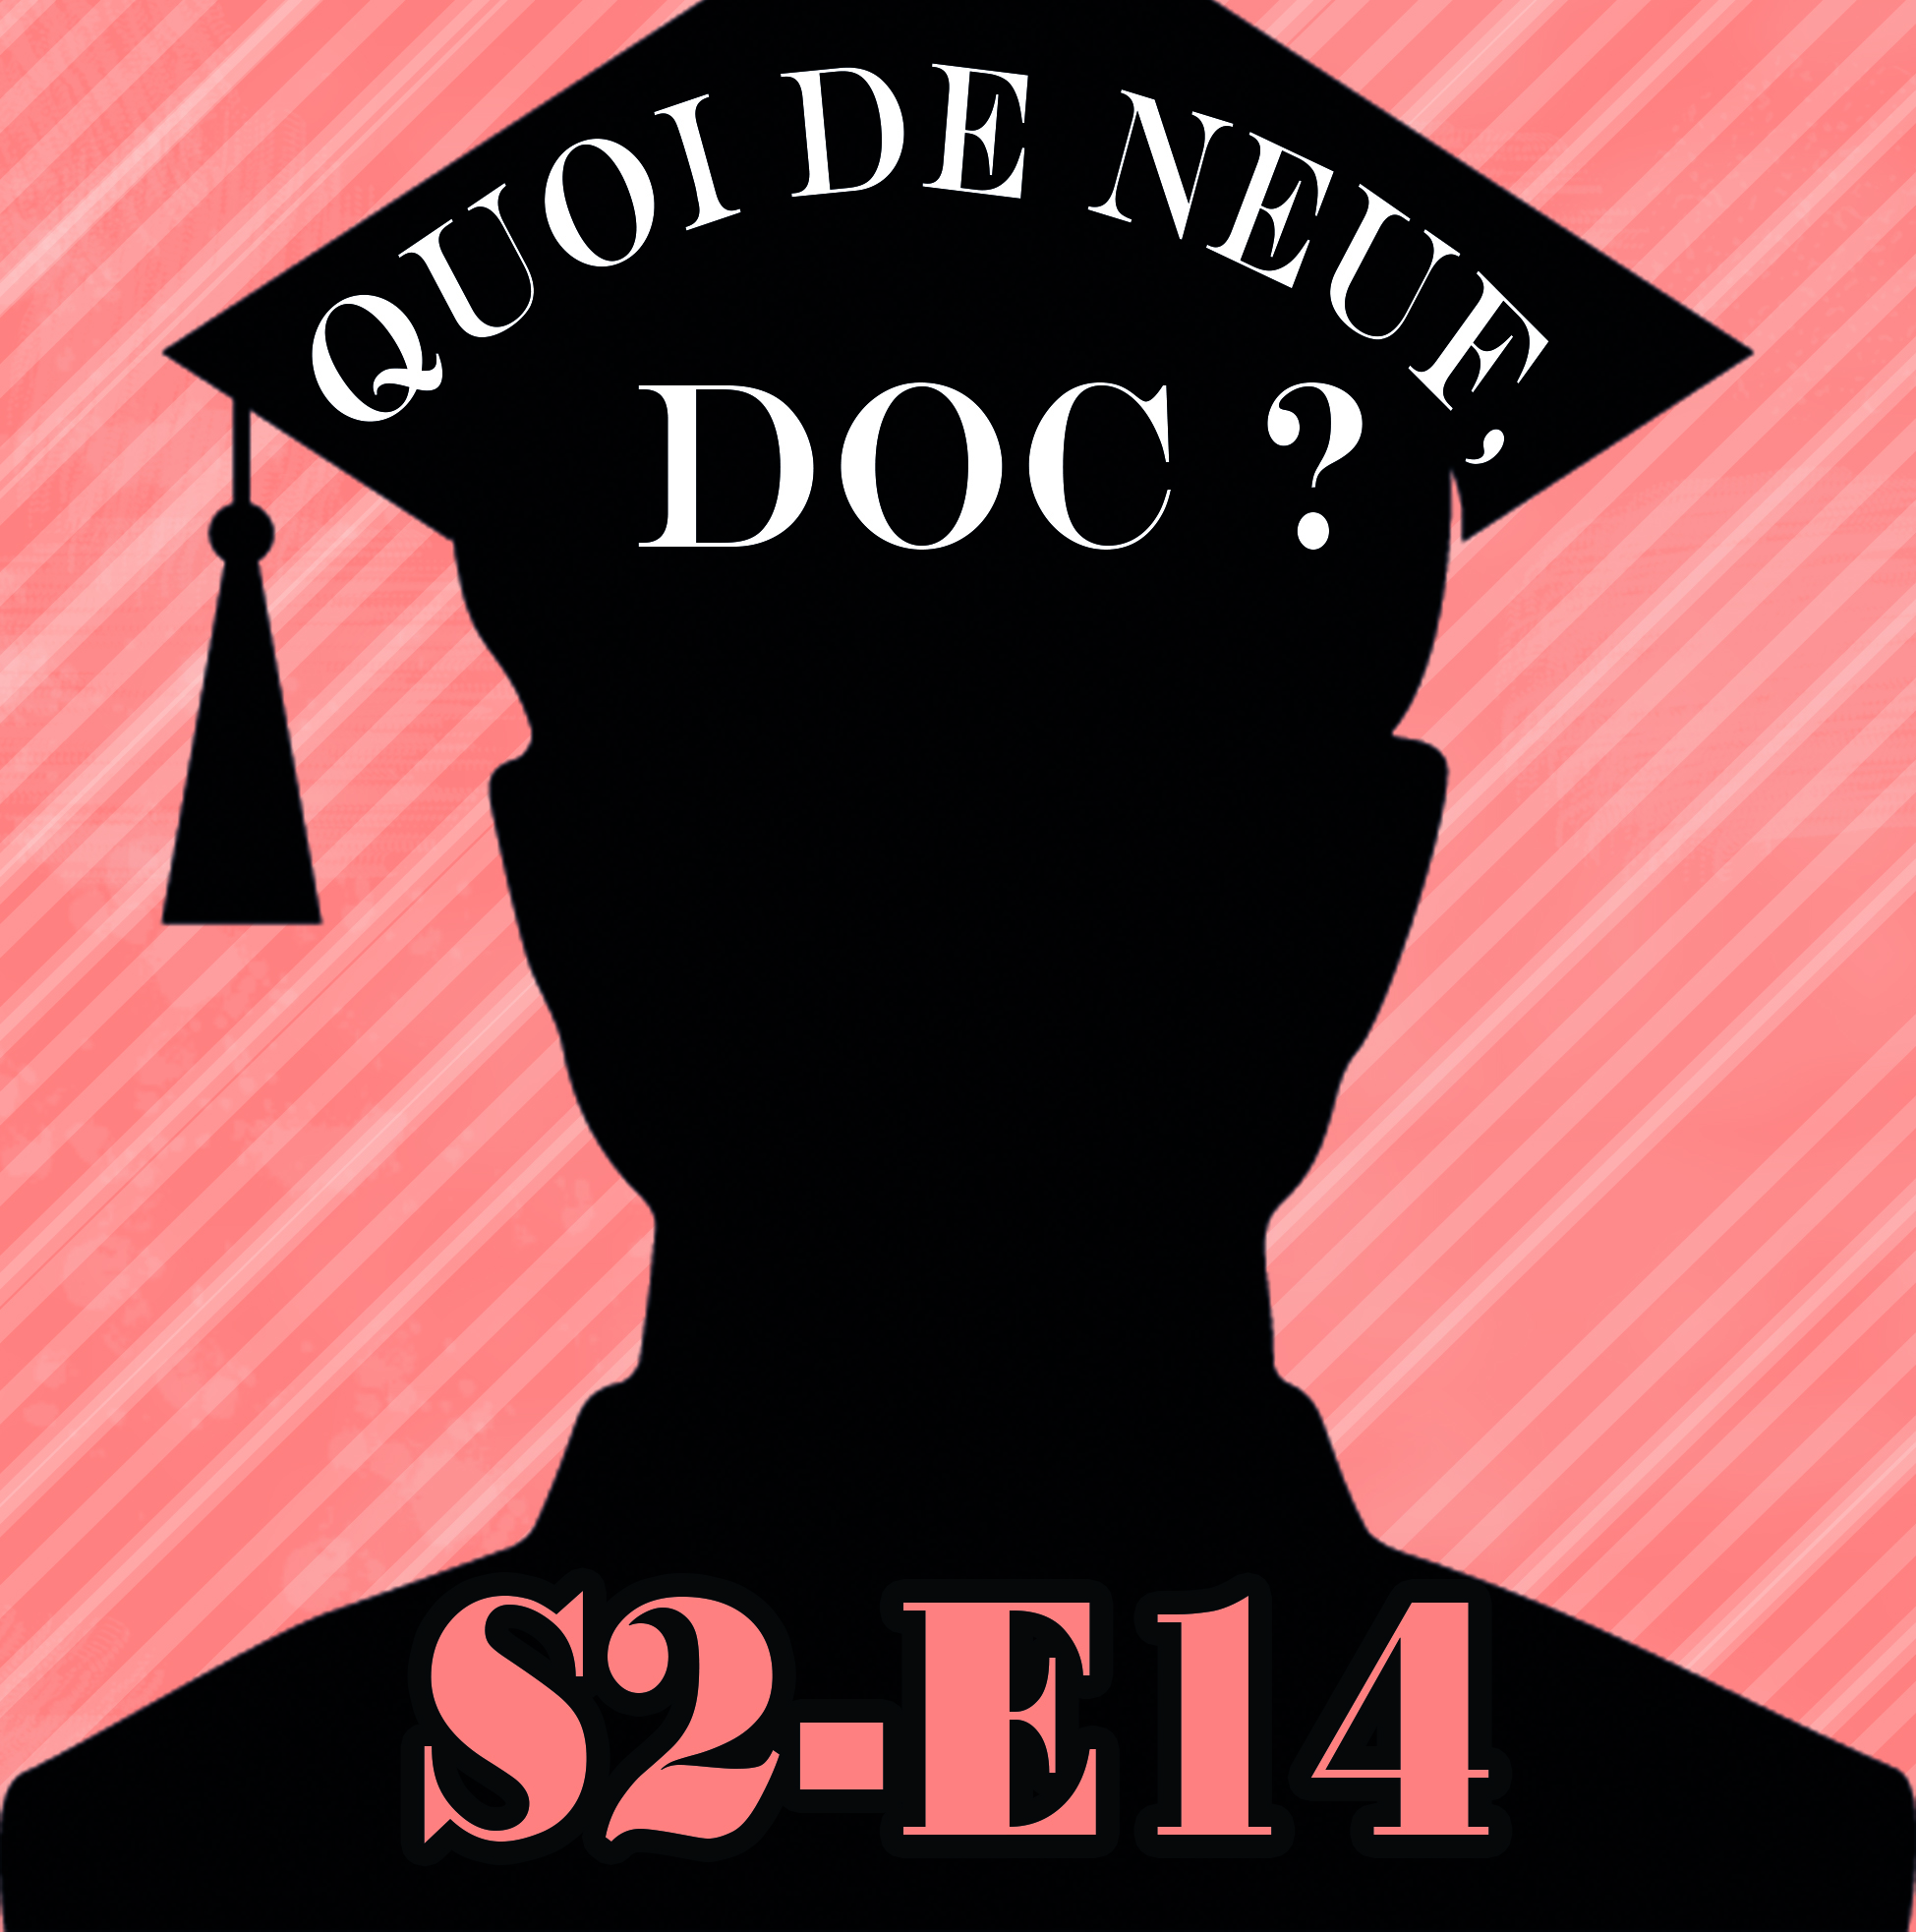 QDND S2E14 Emission du 6 avril